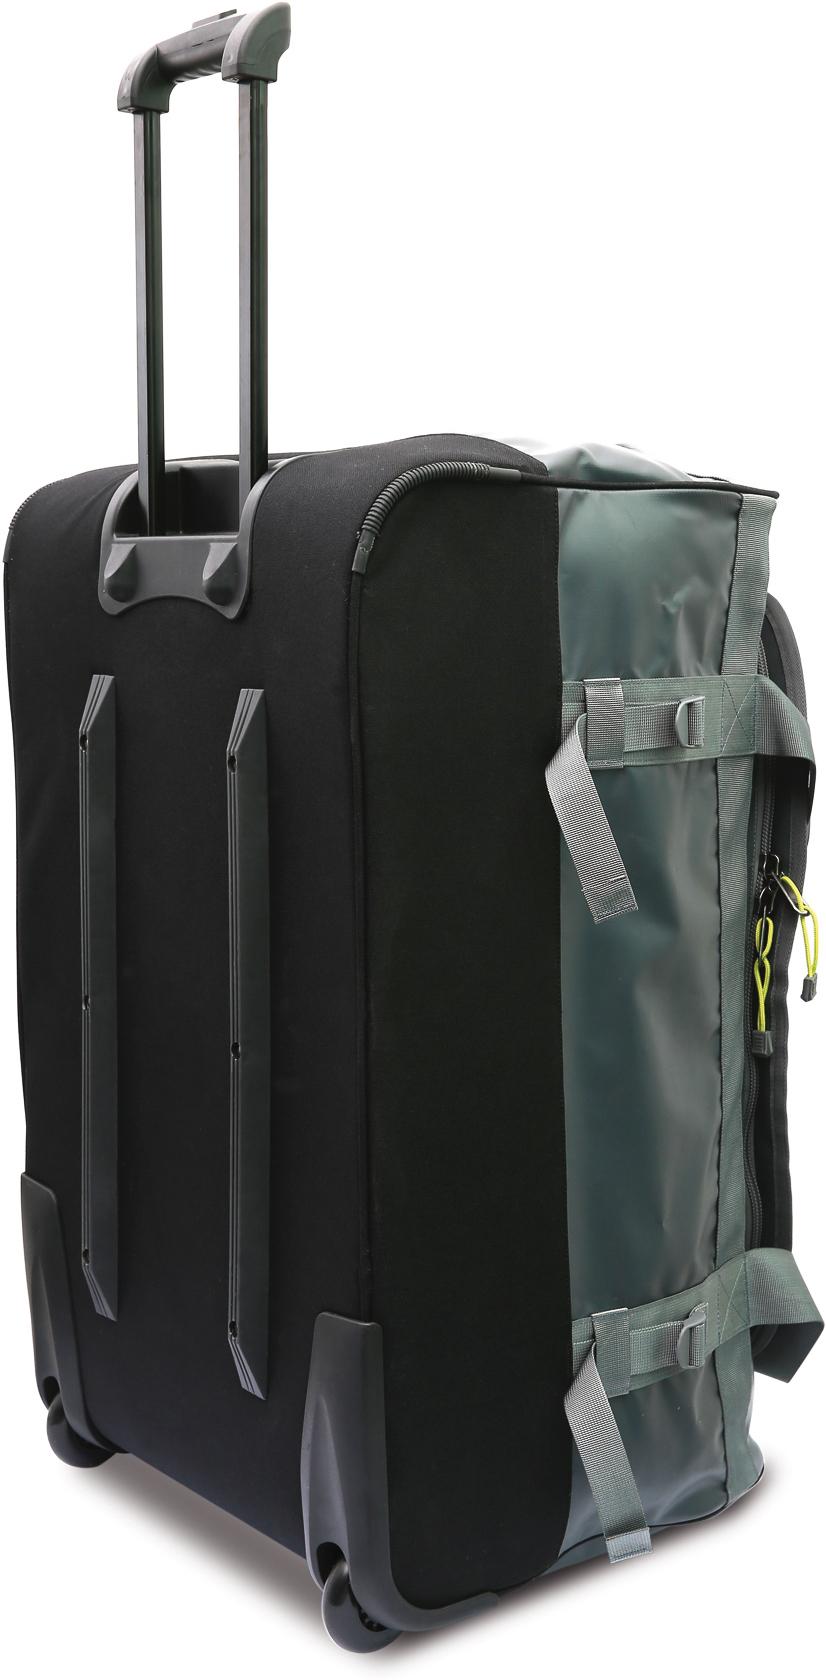 Roller Duffle Bag šedý stojící s vysunutým držadlem